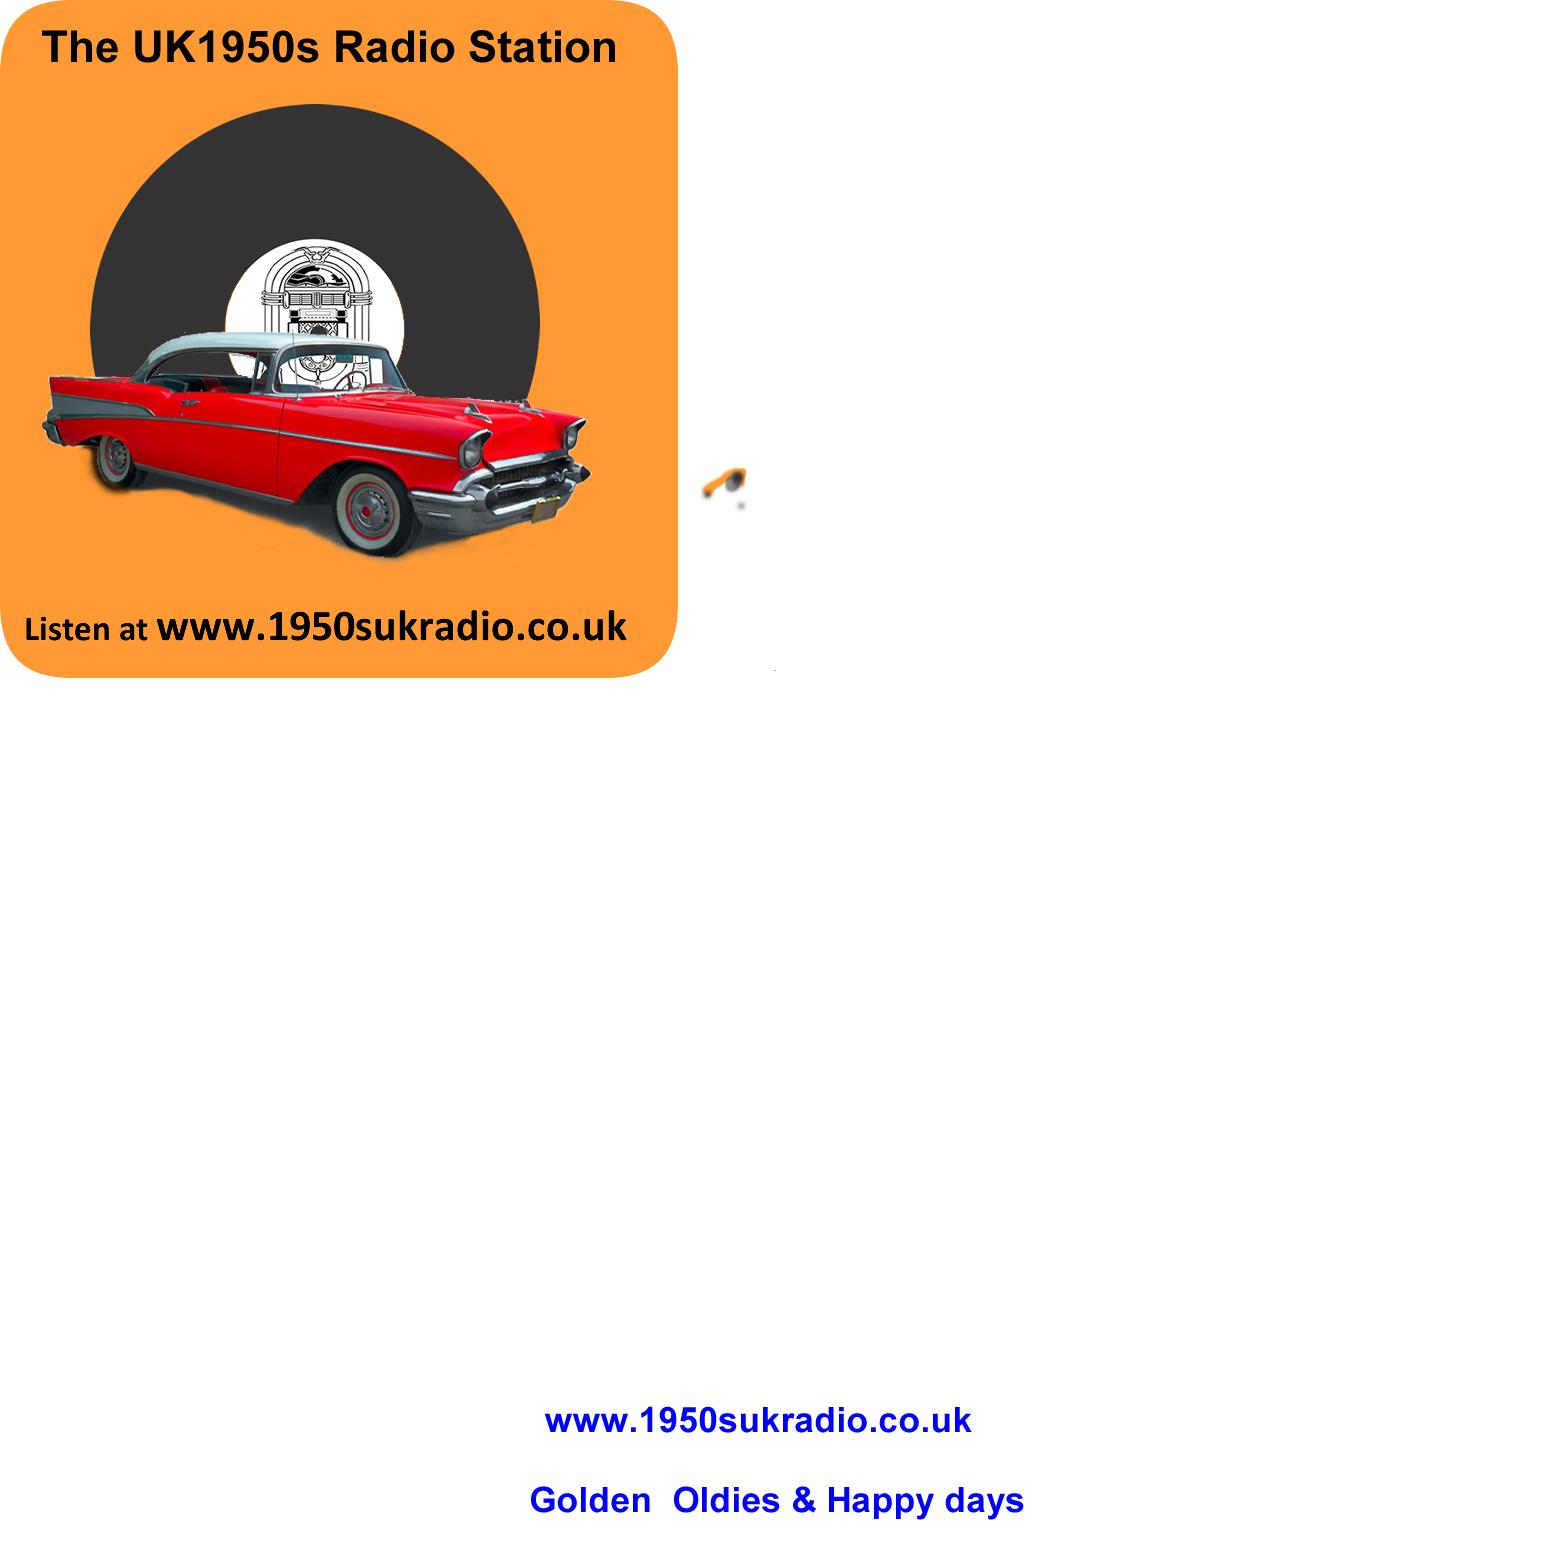 The UK 1950s Radio Station (Main Server)